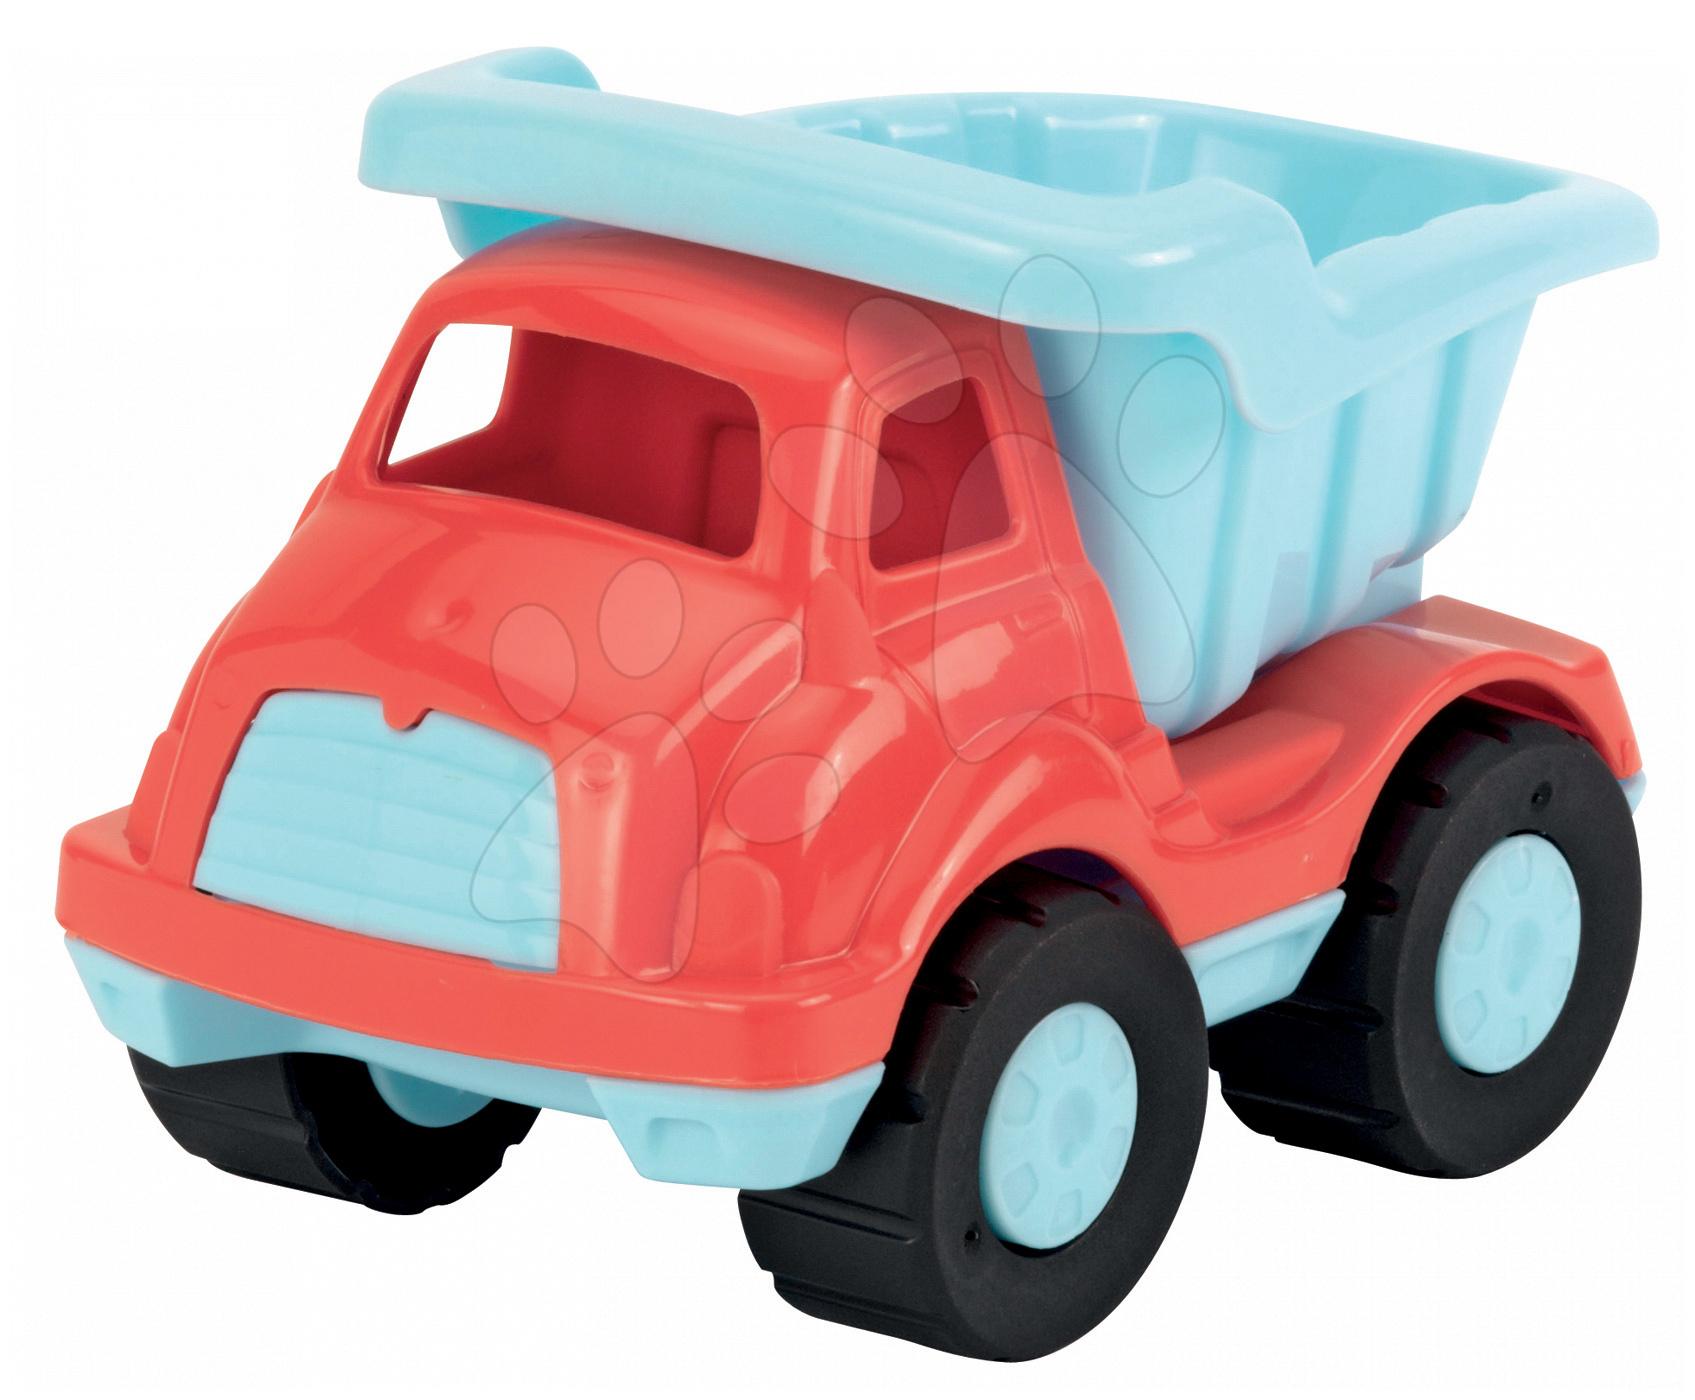 Nákladné autá - Nákladné autíčko Écoiffier dĺžka 16 cm červené od 18 mes